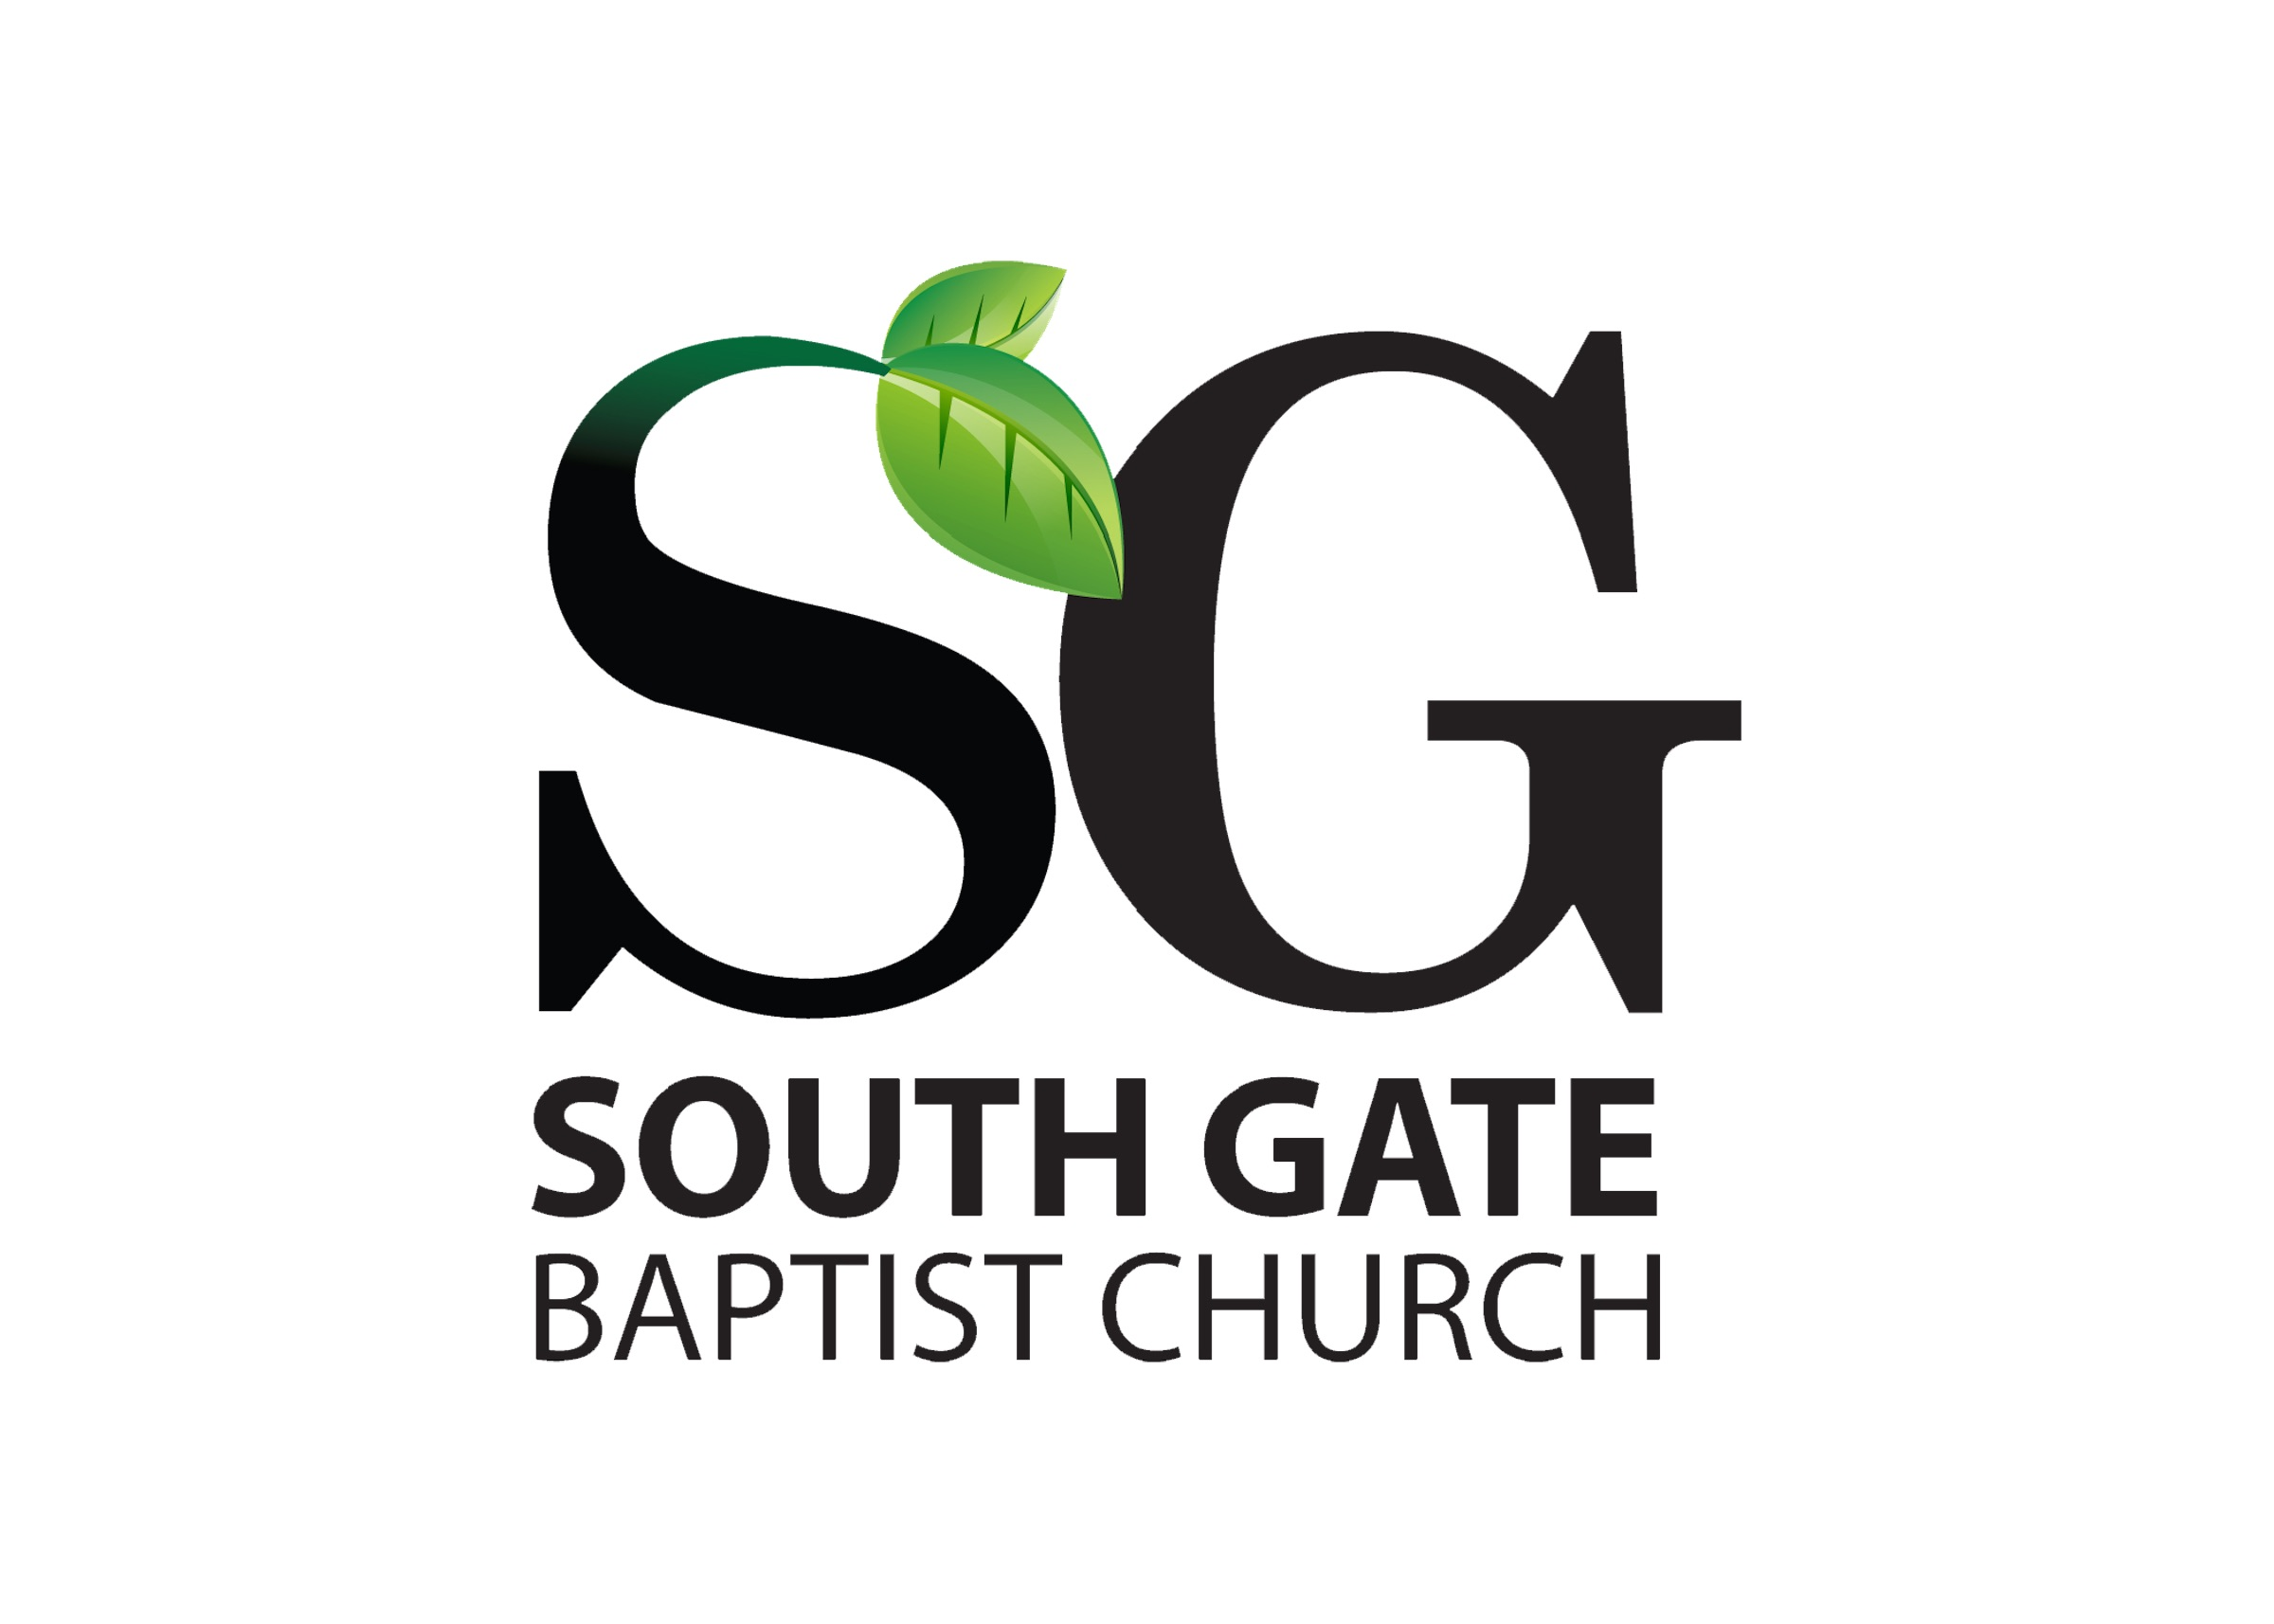 South Gate Baptist Church